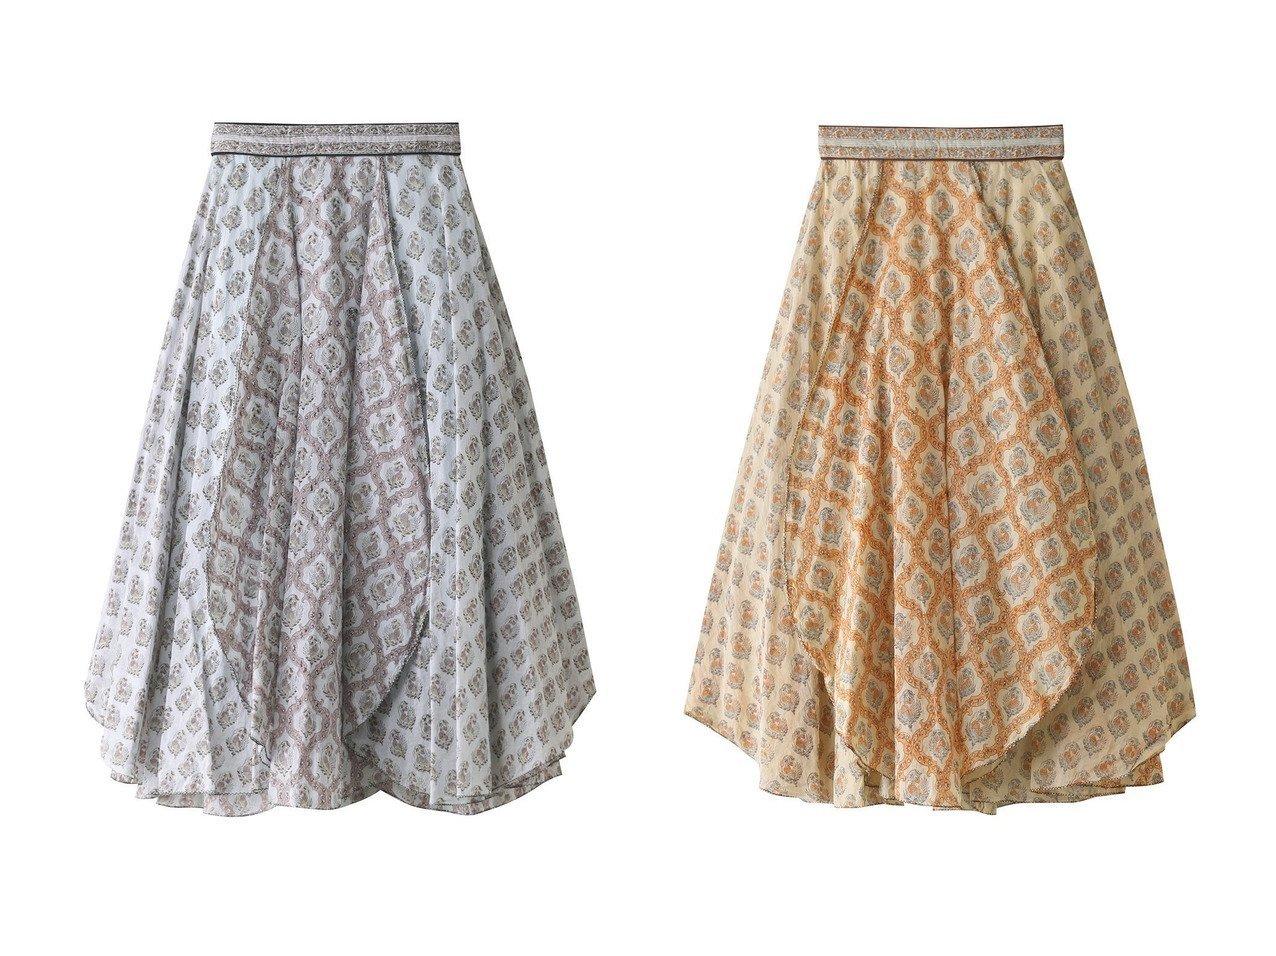 【Pheeta/フィータ】のMabel プリントコットンフレアスカート 【スカート】おすすめ!人気、トレンド・レディースファッションの通販 おすすめで人気の流行・トレンド、ファッションの通販商品 メンズファッション・キッズファッション・インテリア・家具・レディースファッション・服の通販 founy(ファニー) https://founy.com/ ファッション Fashion レディースファッション WOMEN スカート Skirt Aライン/フレアスカート Flared A-Line Skirts ロングスカート Long Skirt インド オーガンジー フォルム フレア ブロック プリント ロング |ID:crp329100000035428